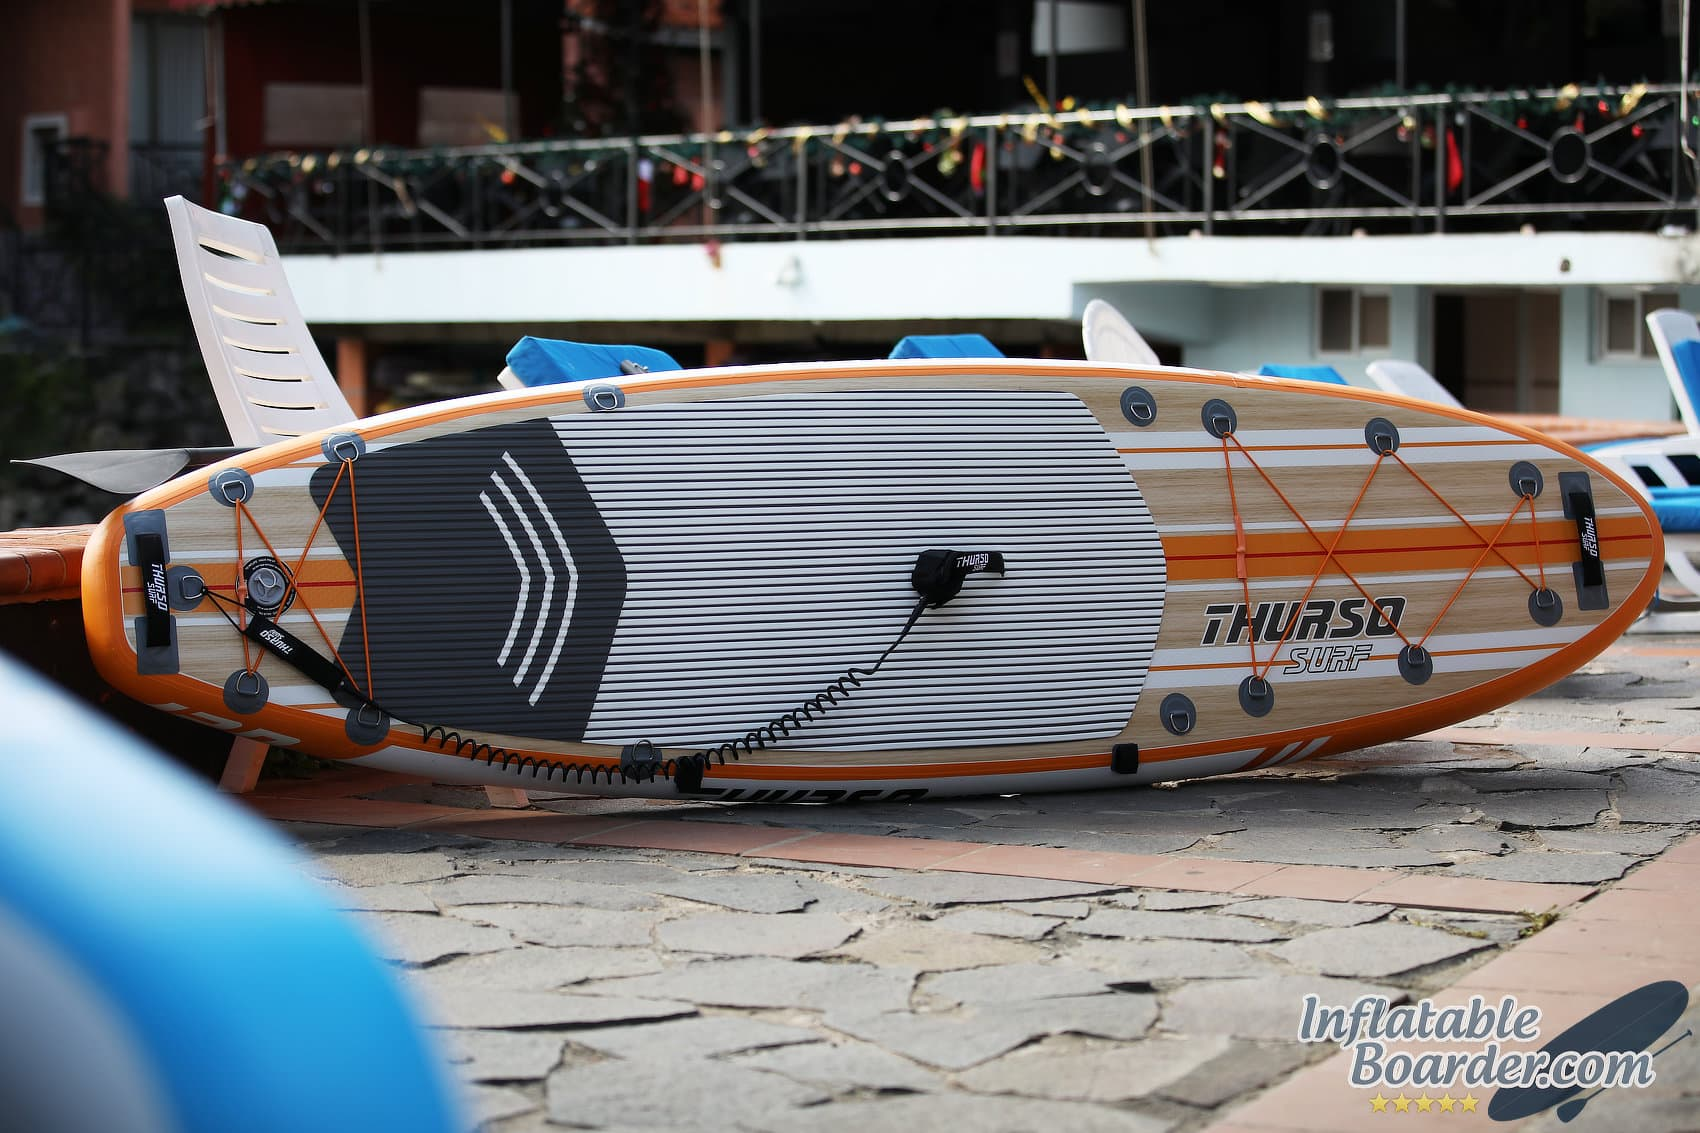 THURSO SURF Inflatable SUP